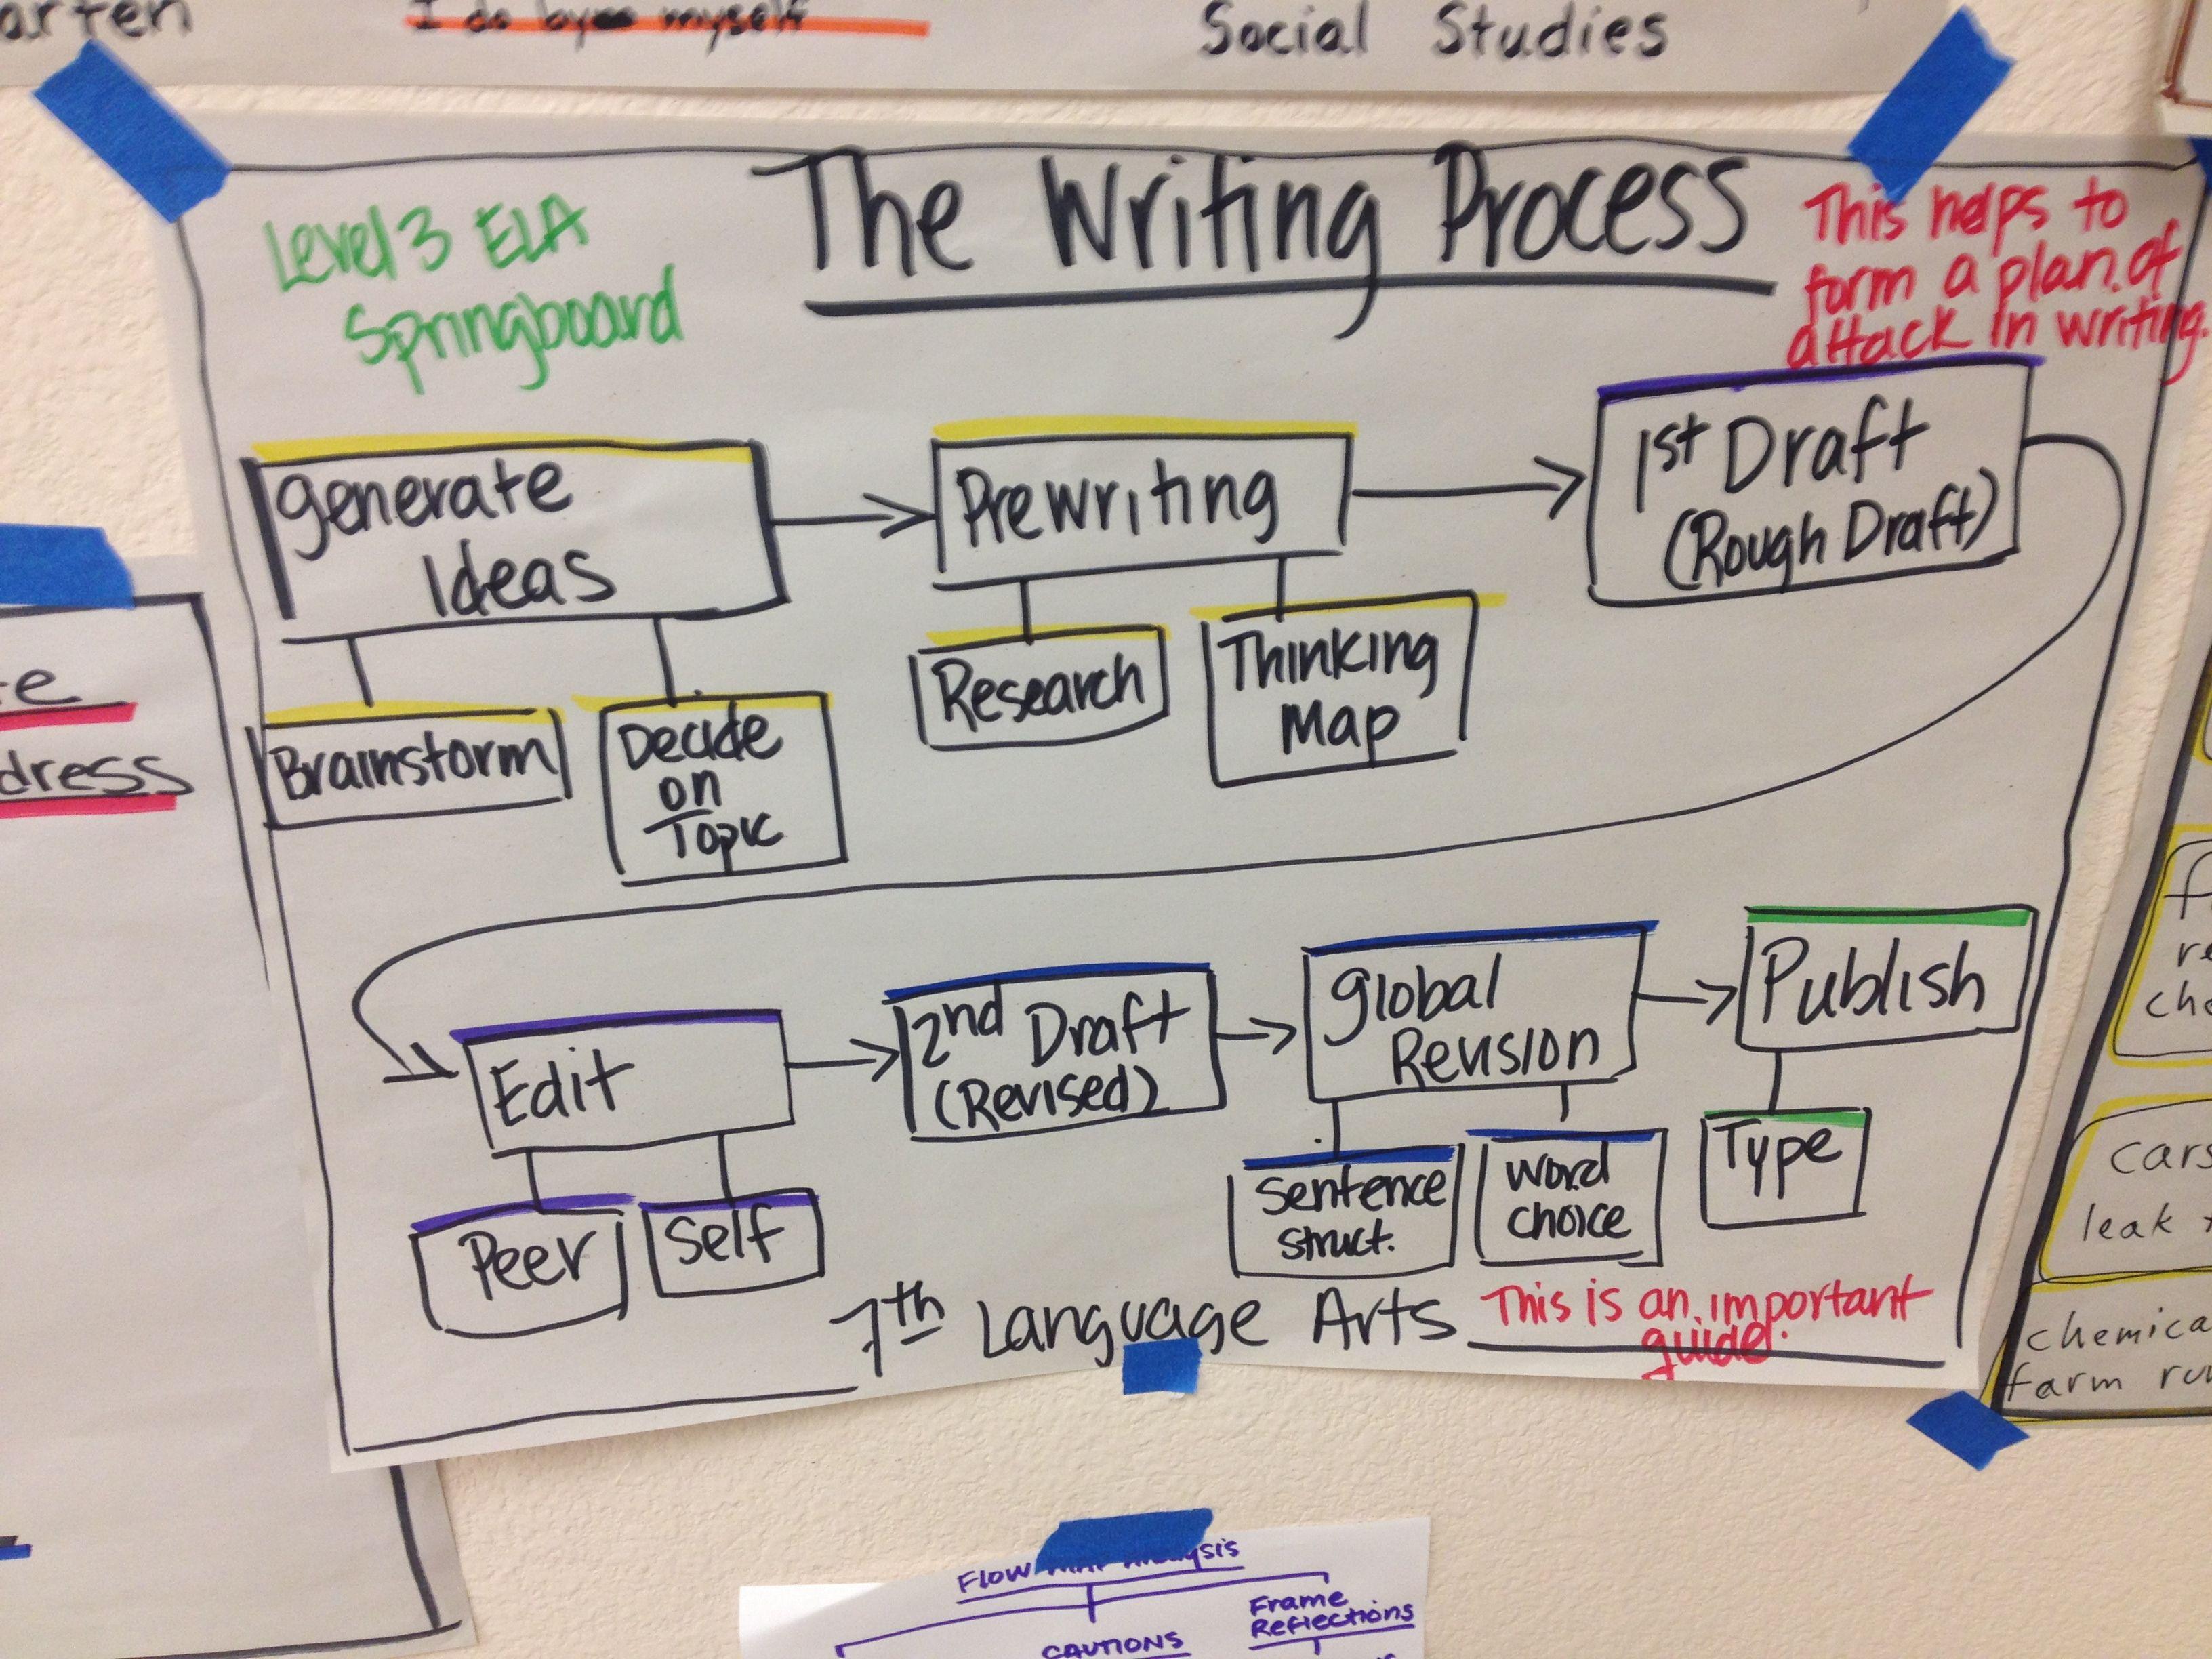 The Writing Process Thinking Map